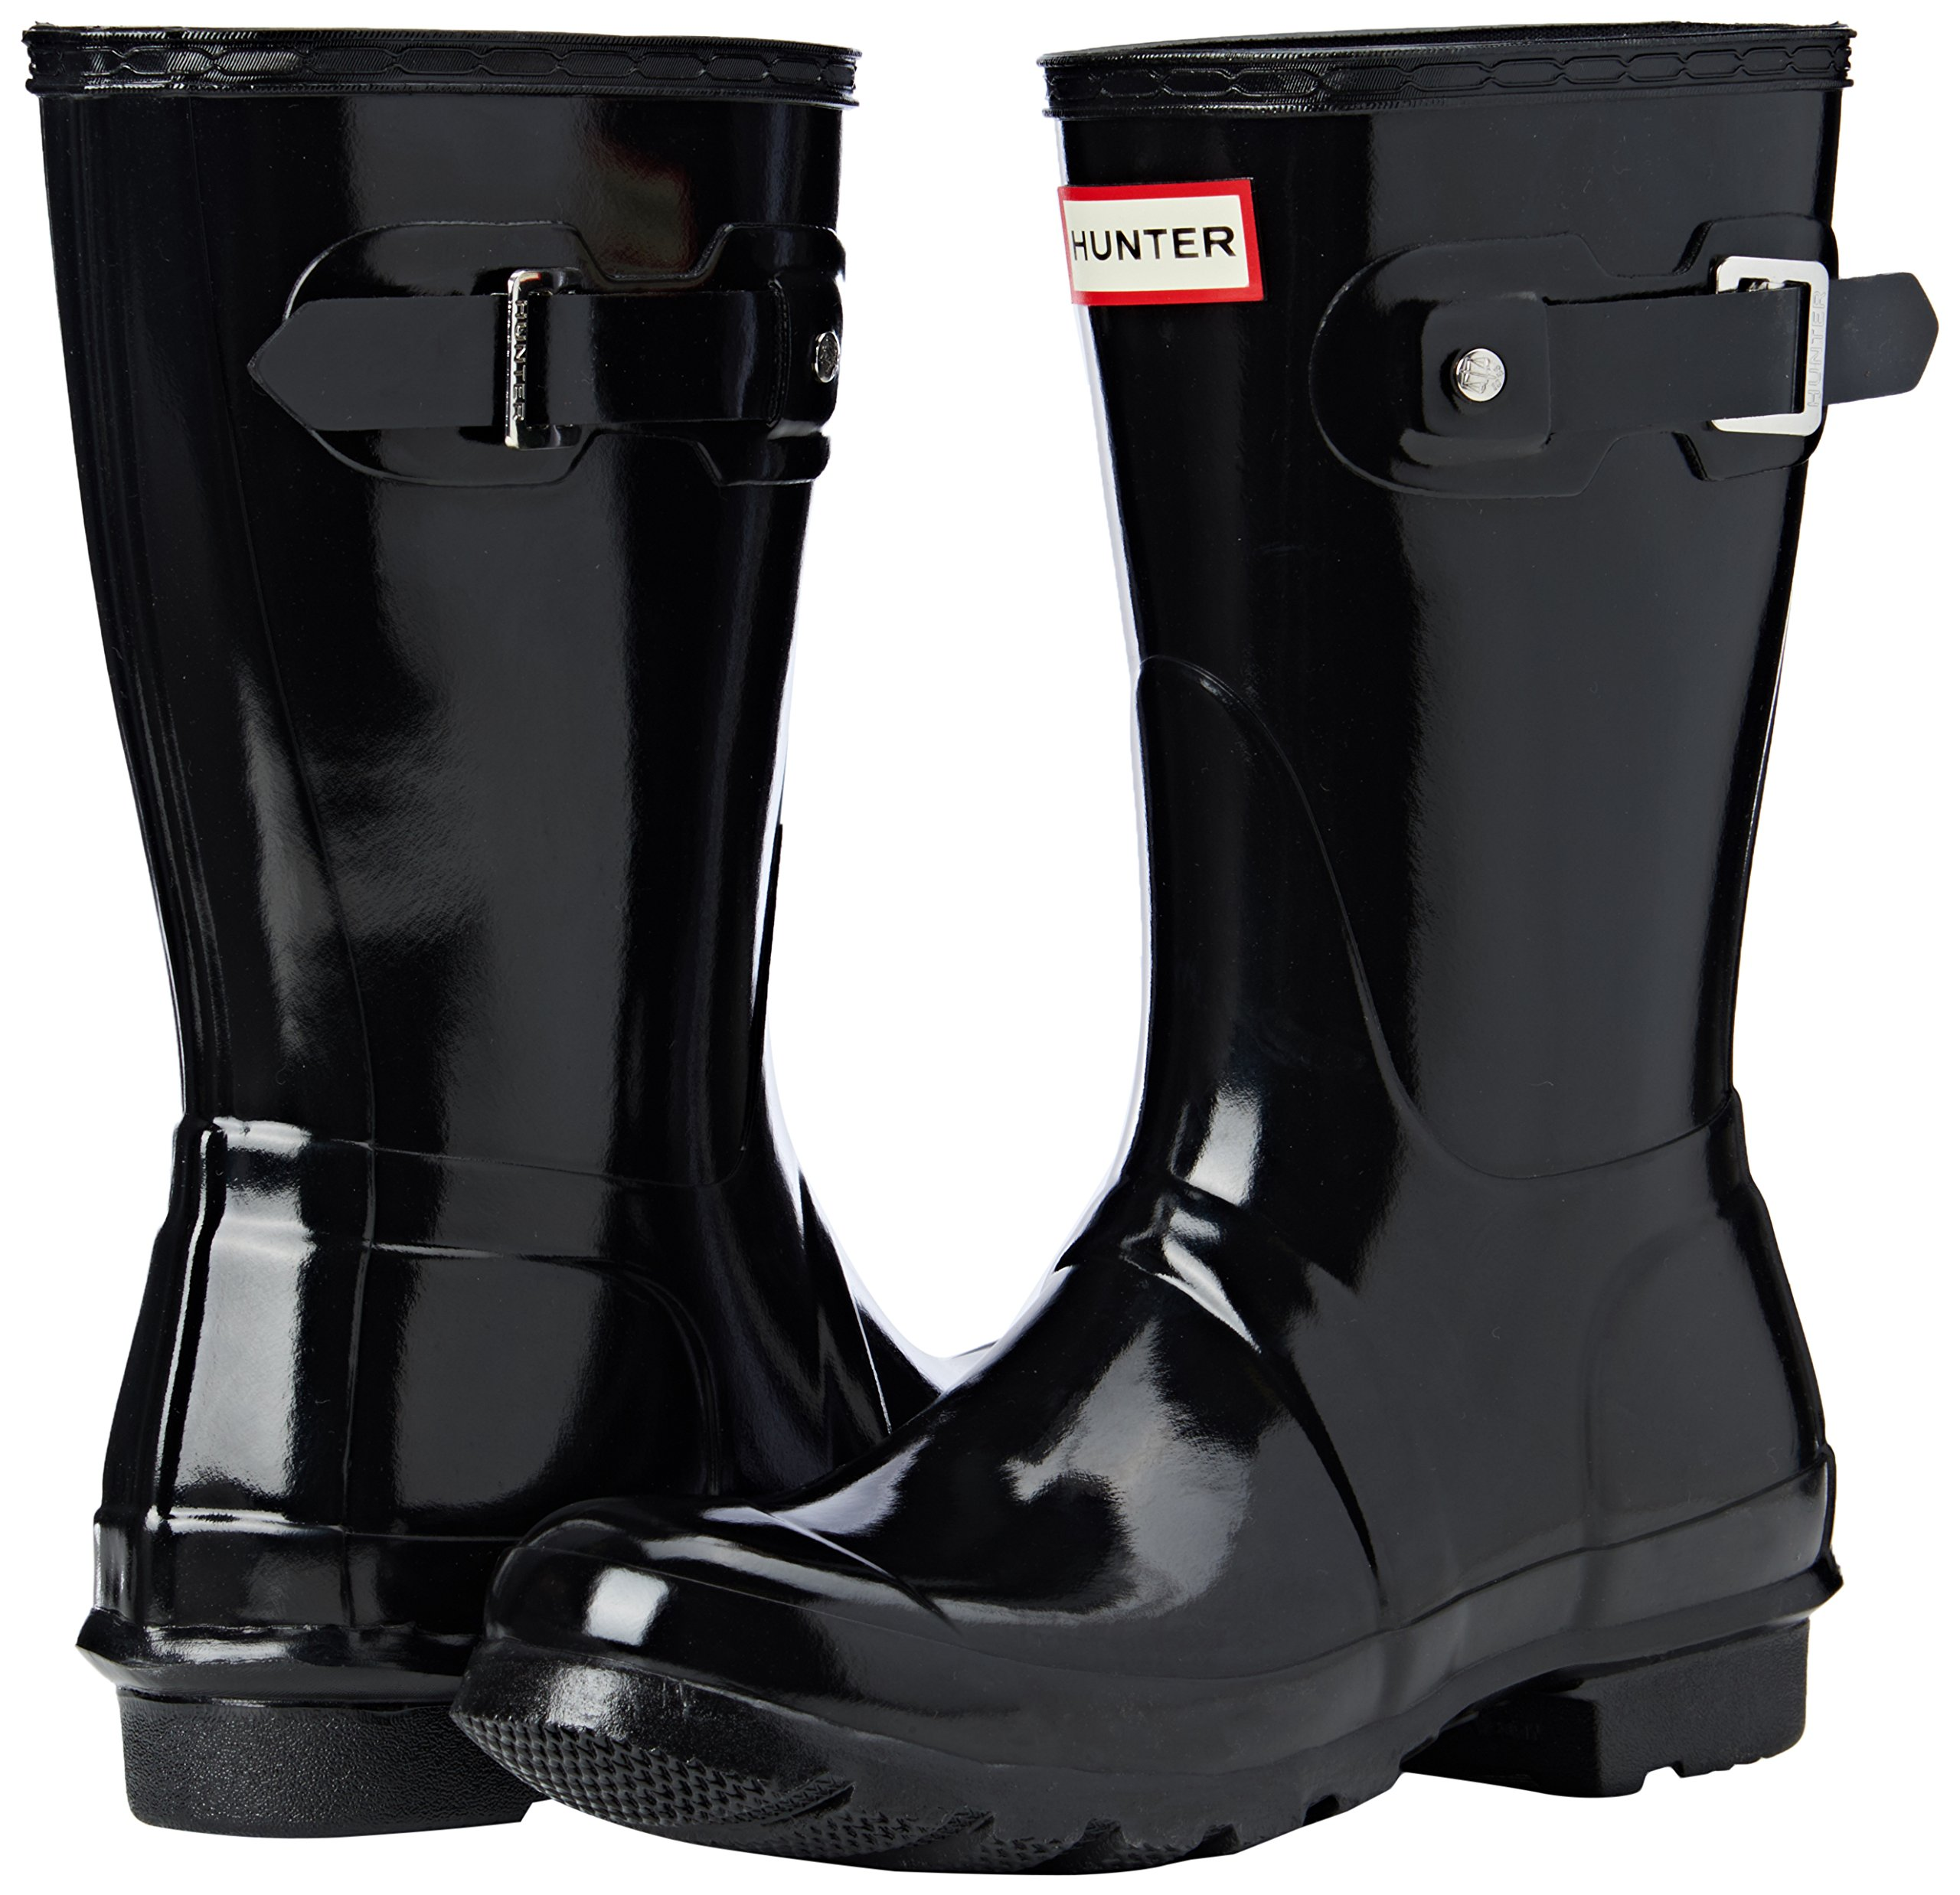 Hunter-WFS1000RGL-Women-039-s-Original-Short-Gloss-Boots-All-Colors thumbnail 8